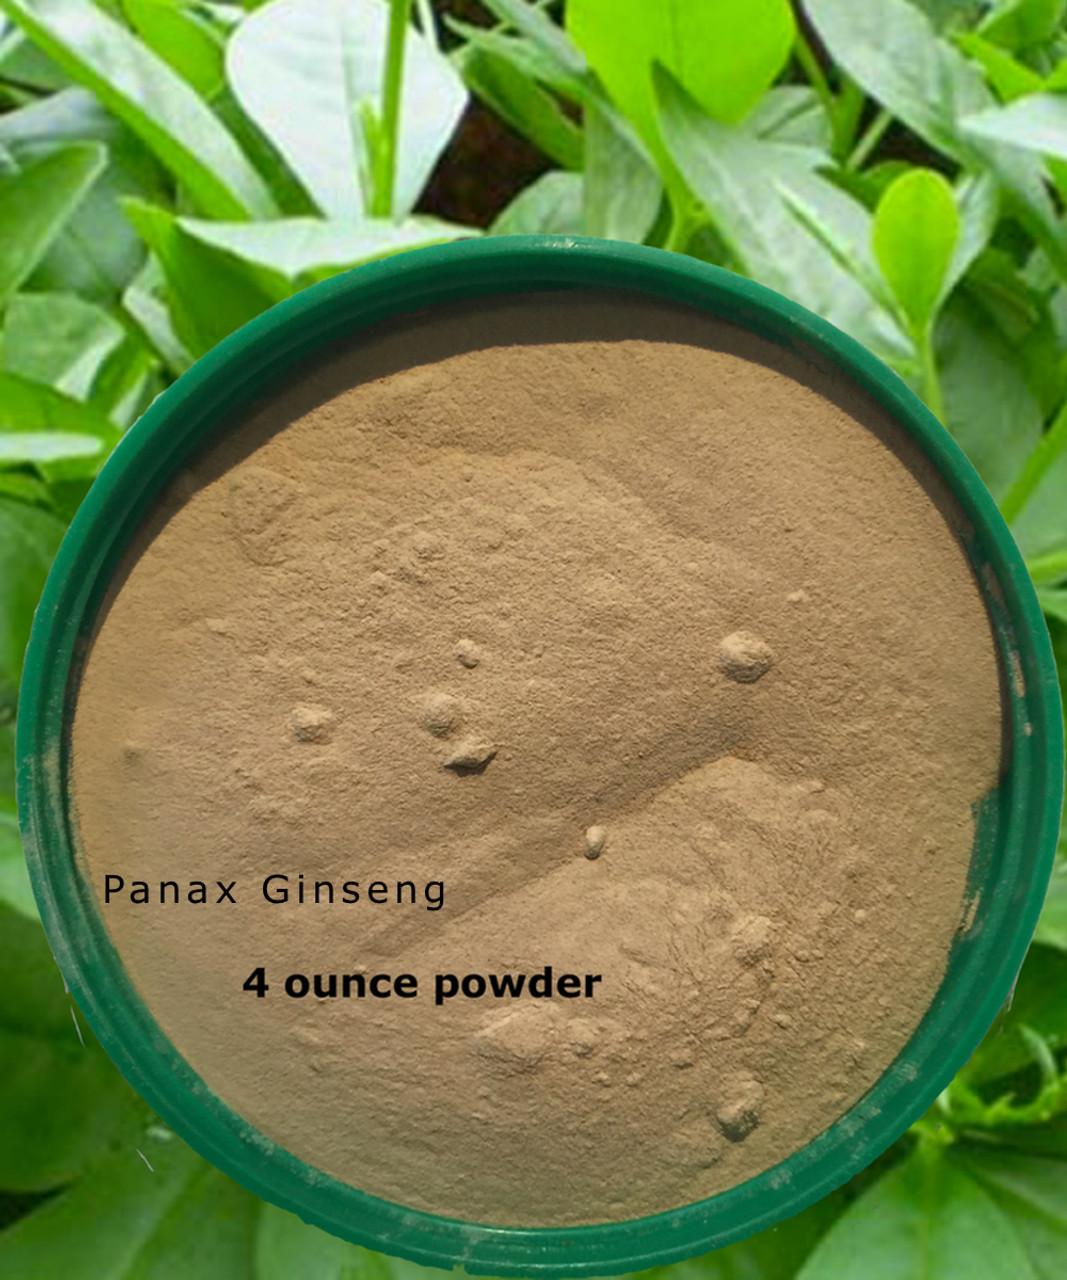 Ginseng Panax Powder